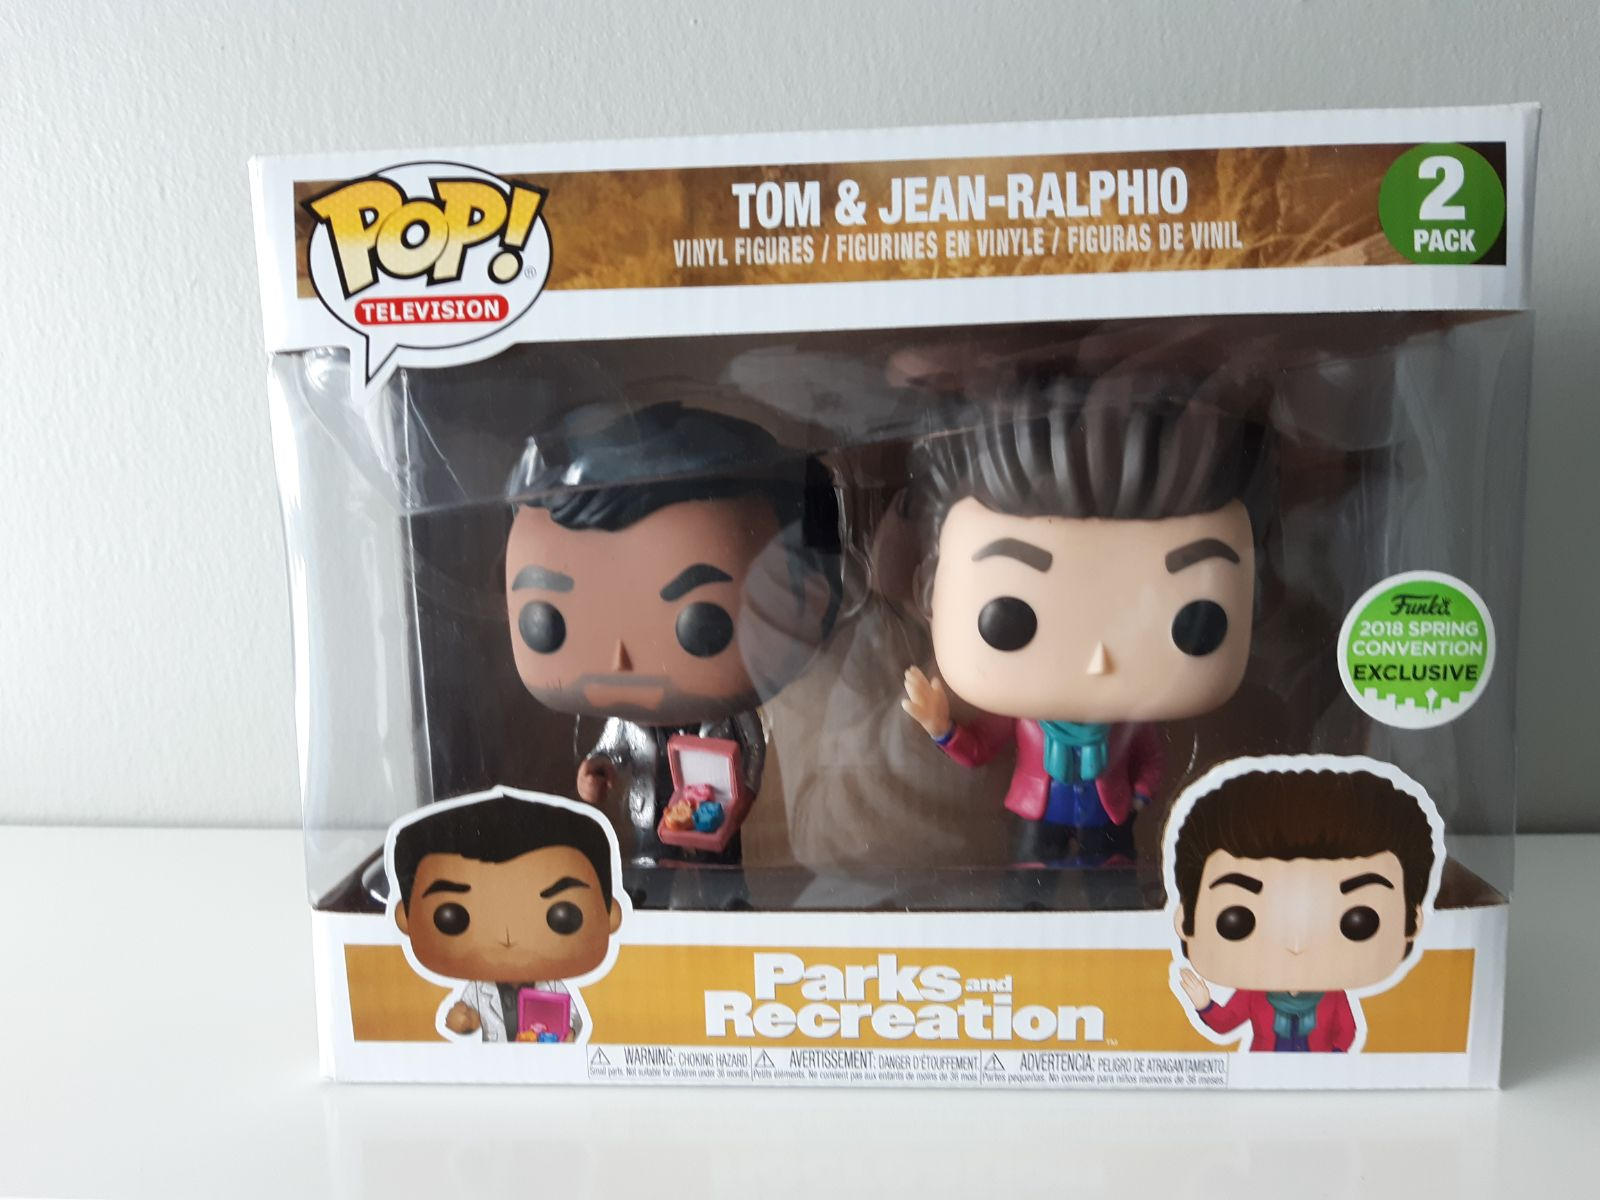 Tom & Jean-Ralphio Funko Pop